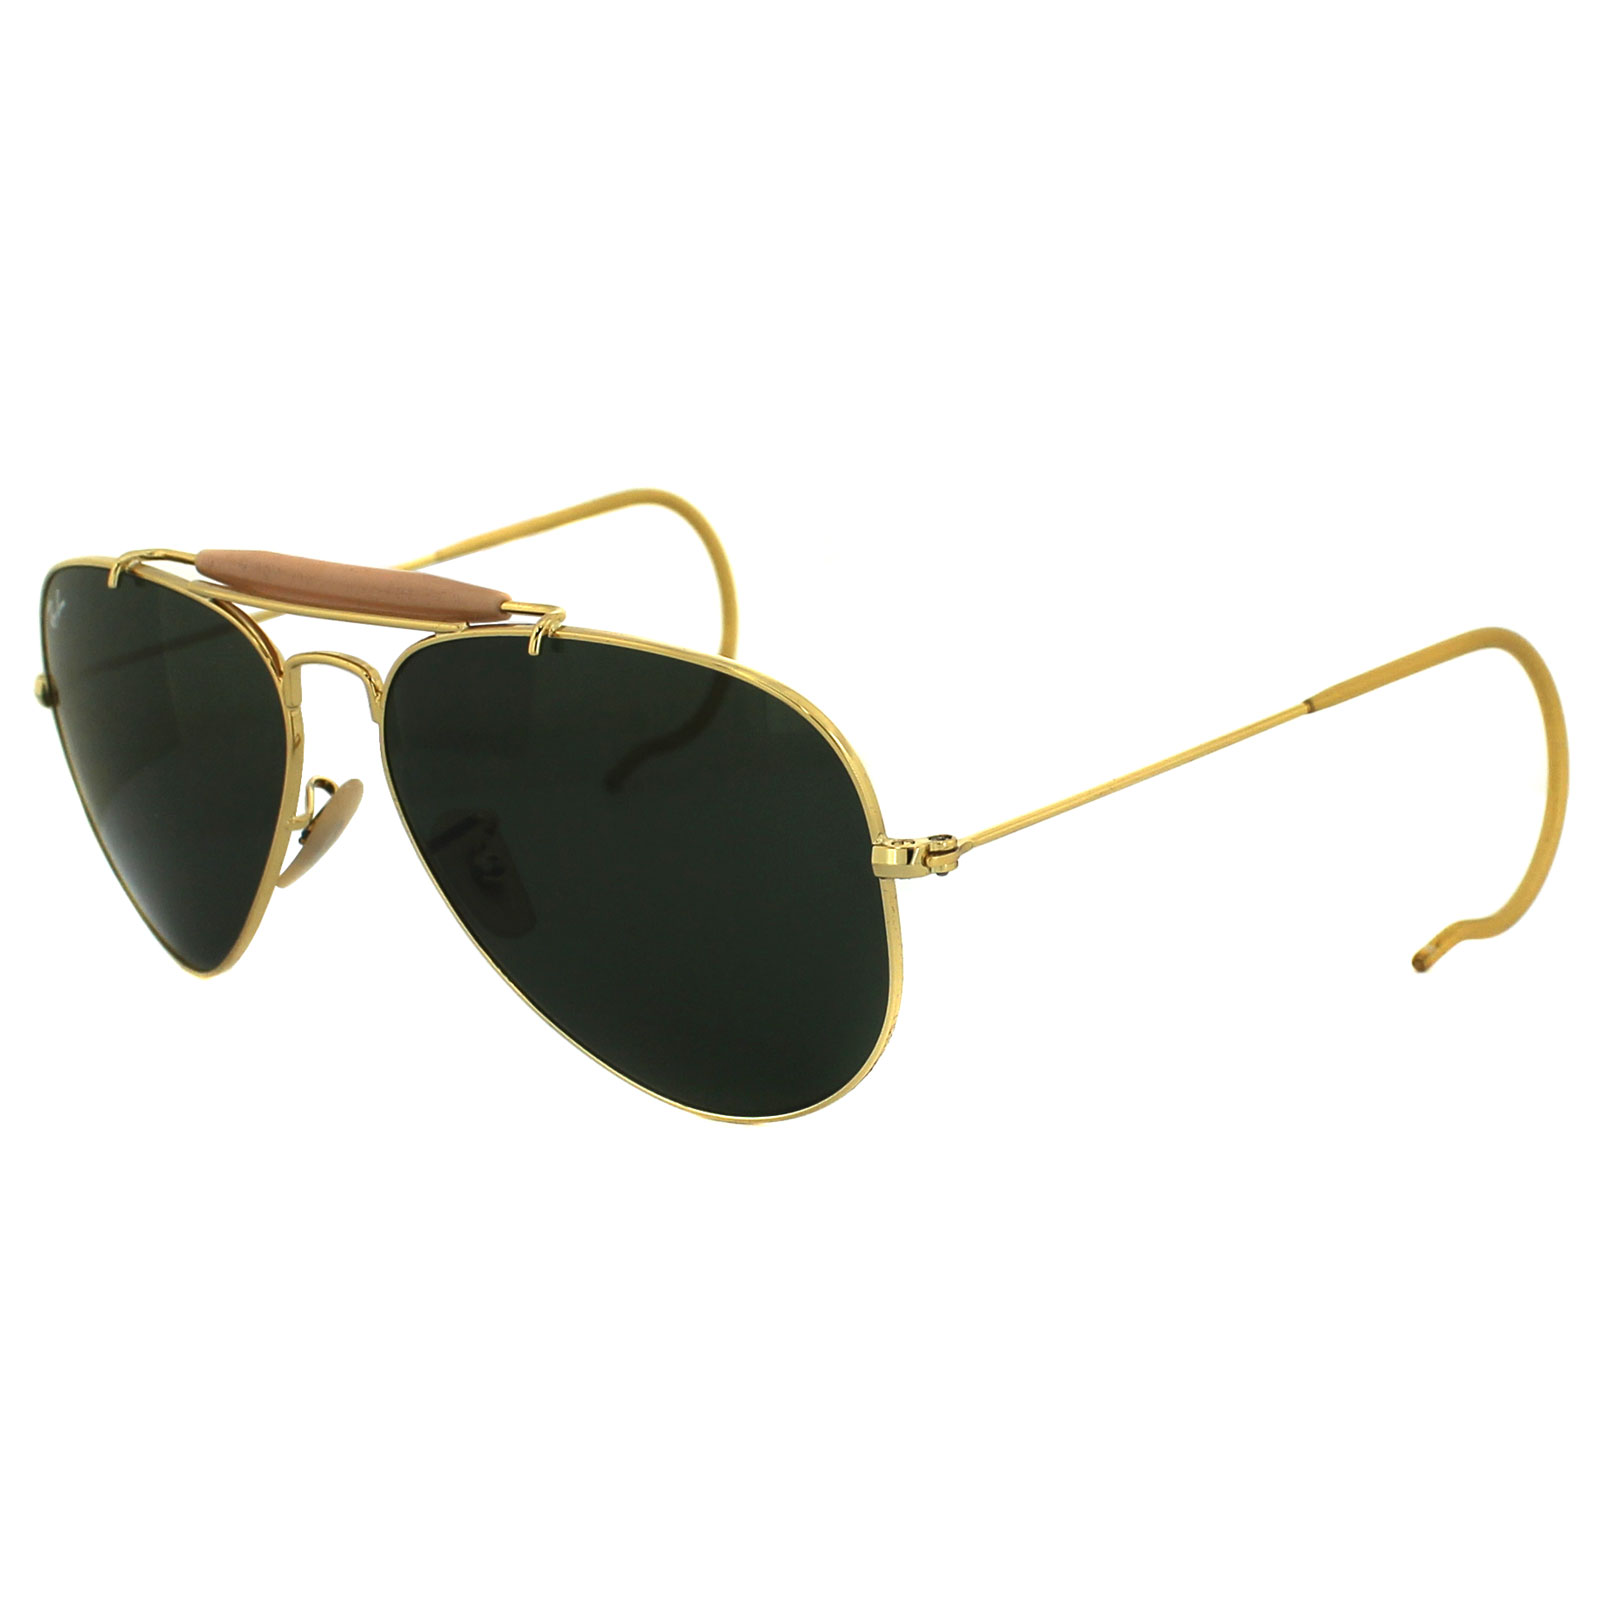 a5192093e2 Ray-Ban Sunglasses Outdoorsman 3030 L0216 Gold Green 805289602163